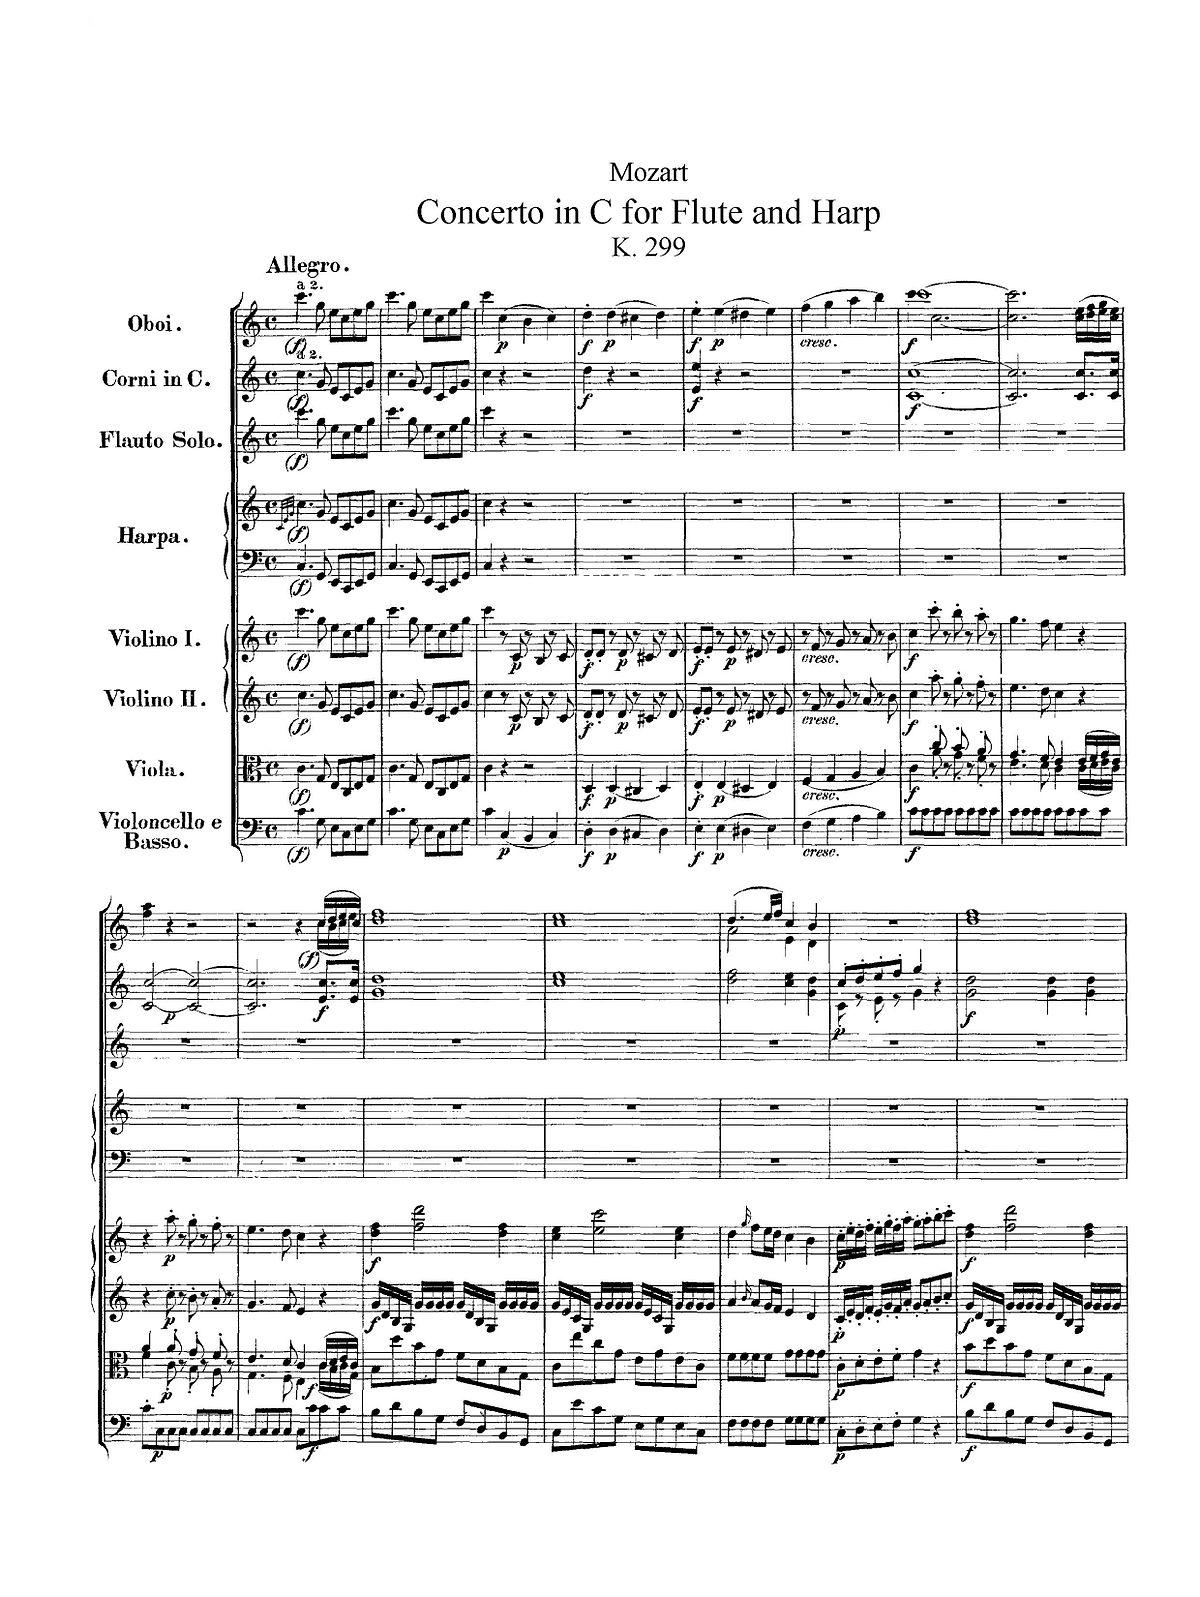 Concerto for Flute, Harp, and Orchestra (Mozart) - Wikipedia